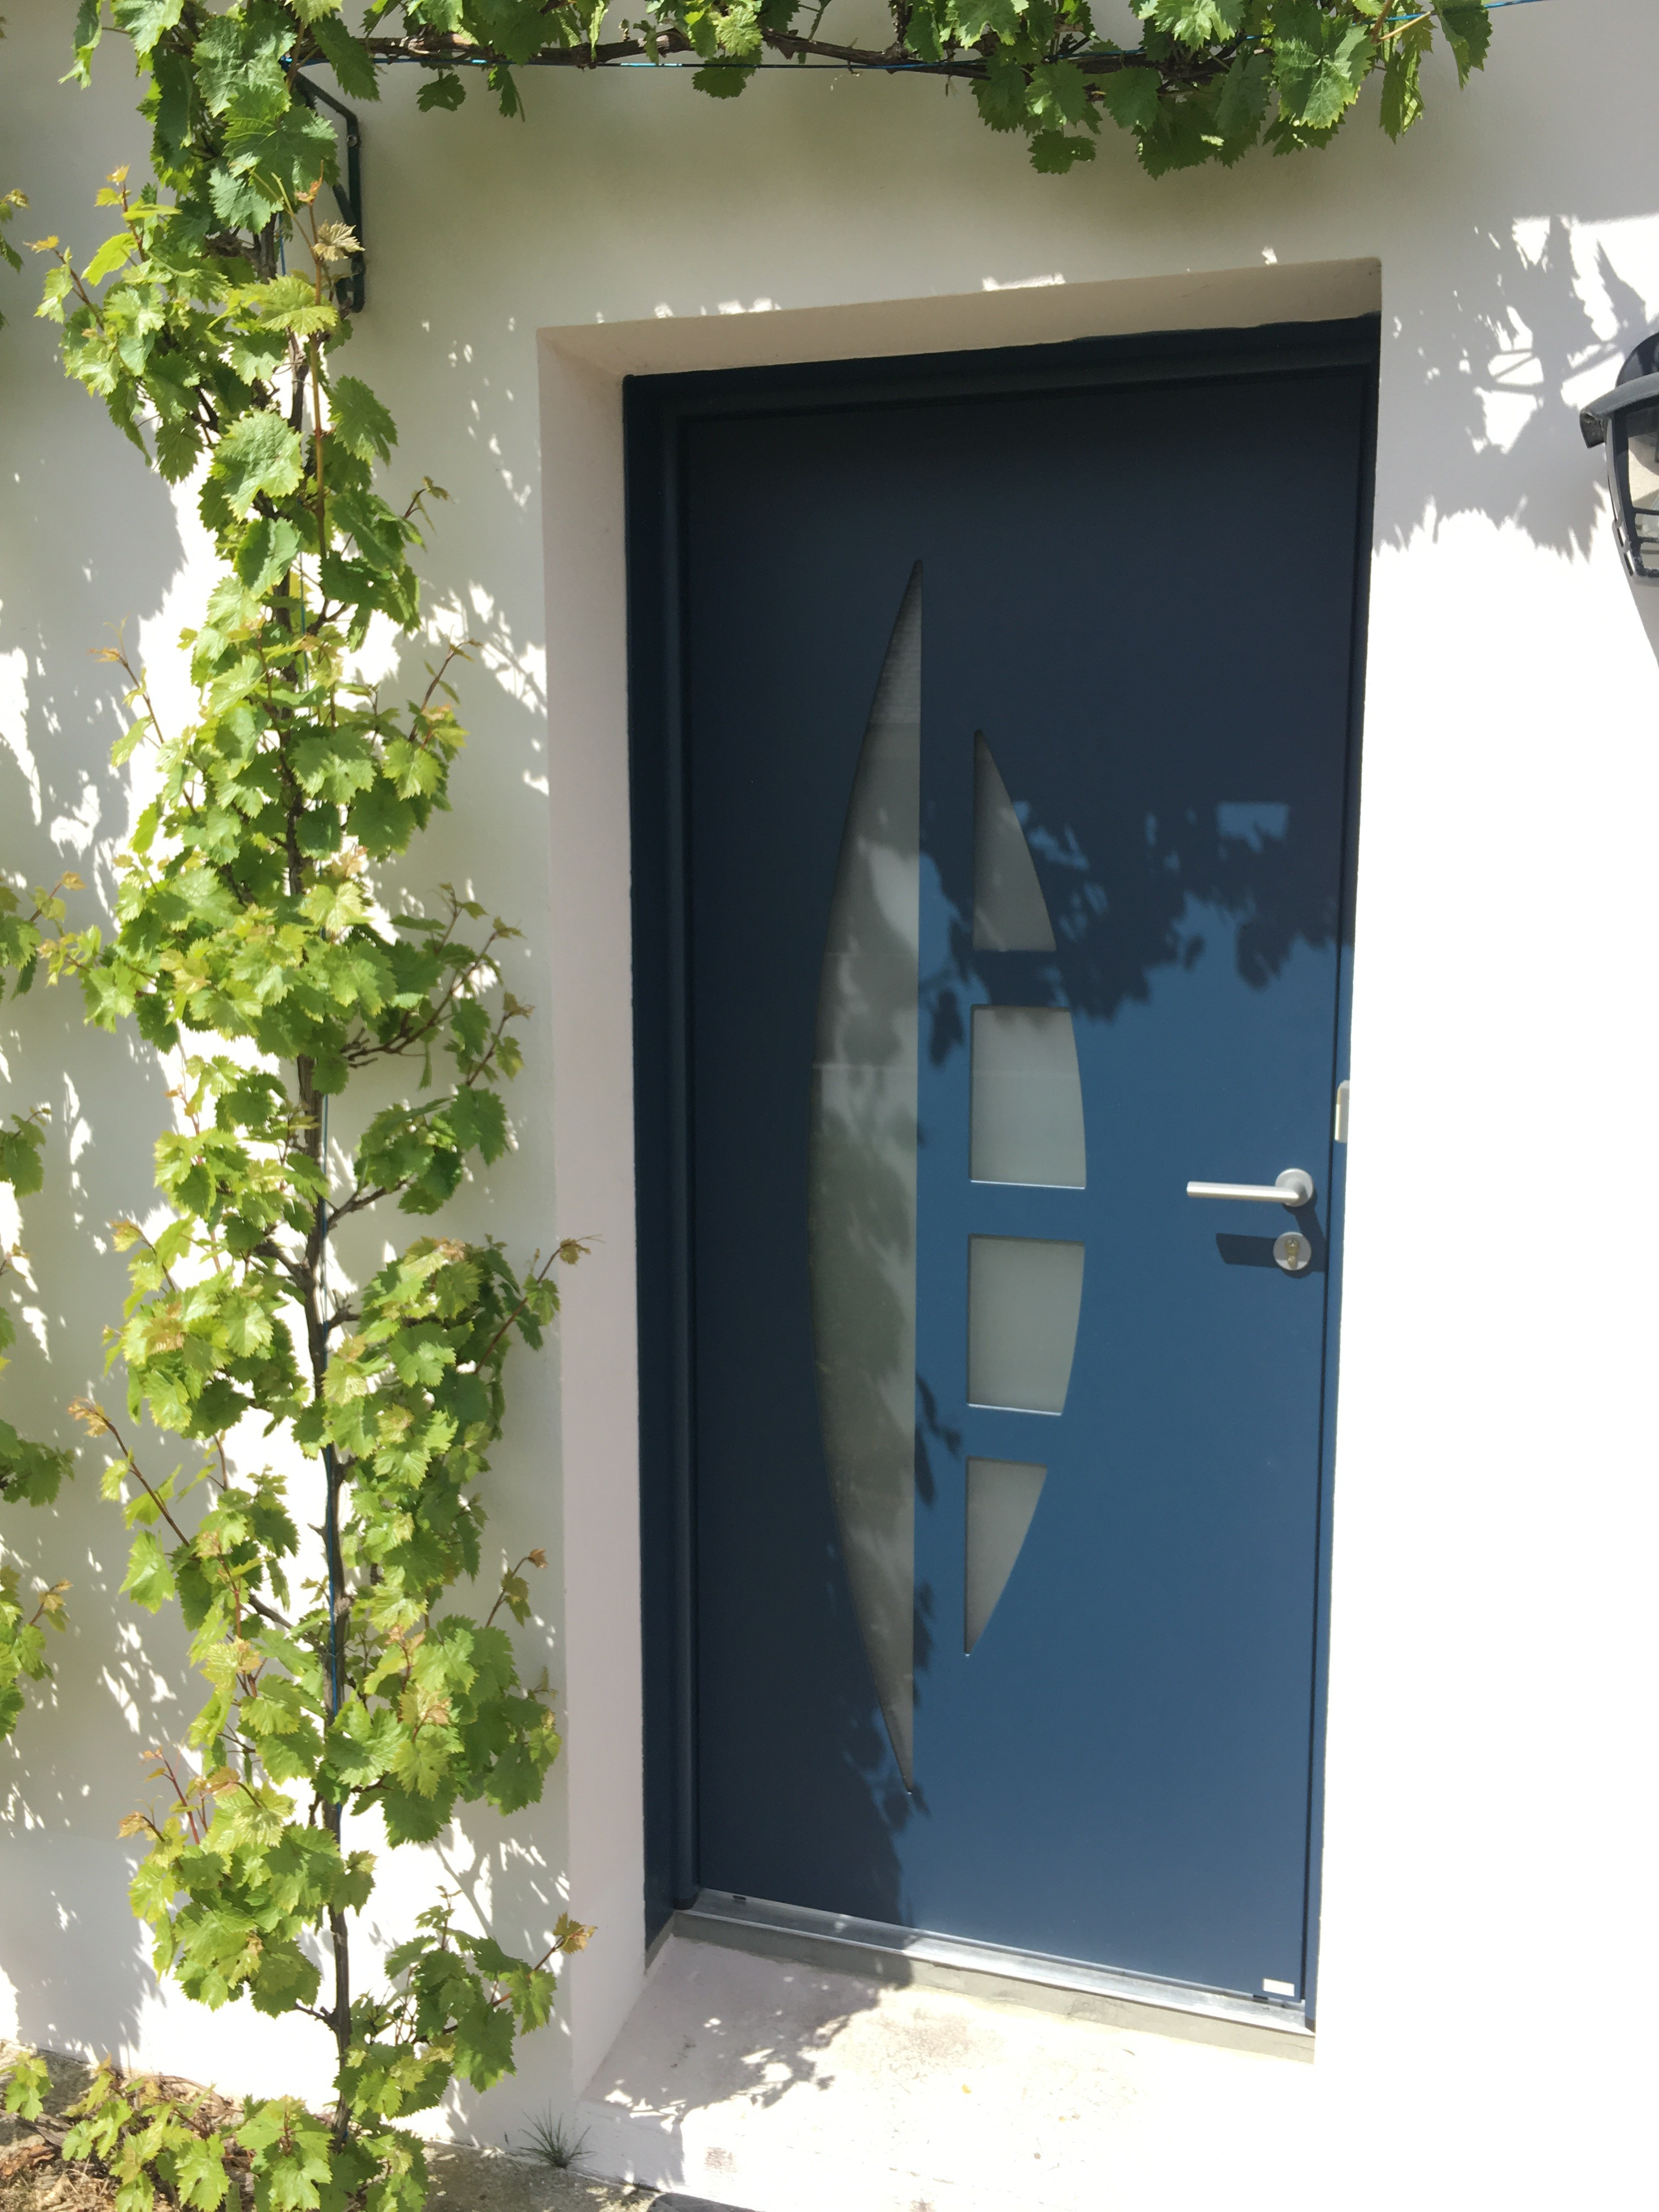 Porte d entr e bel m r alis e brech aluminium56 - Barillet porte d entree ...